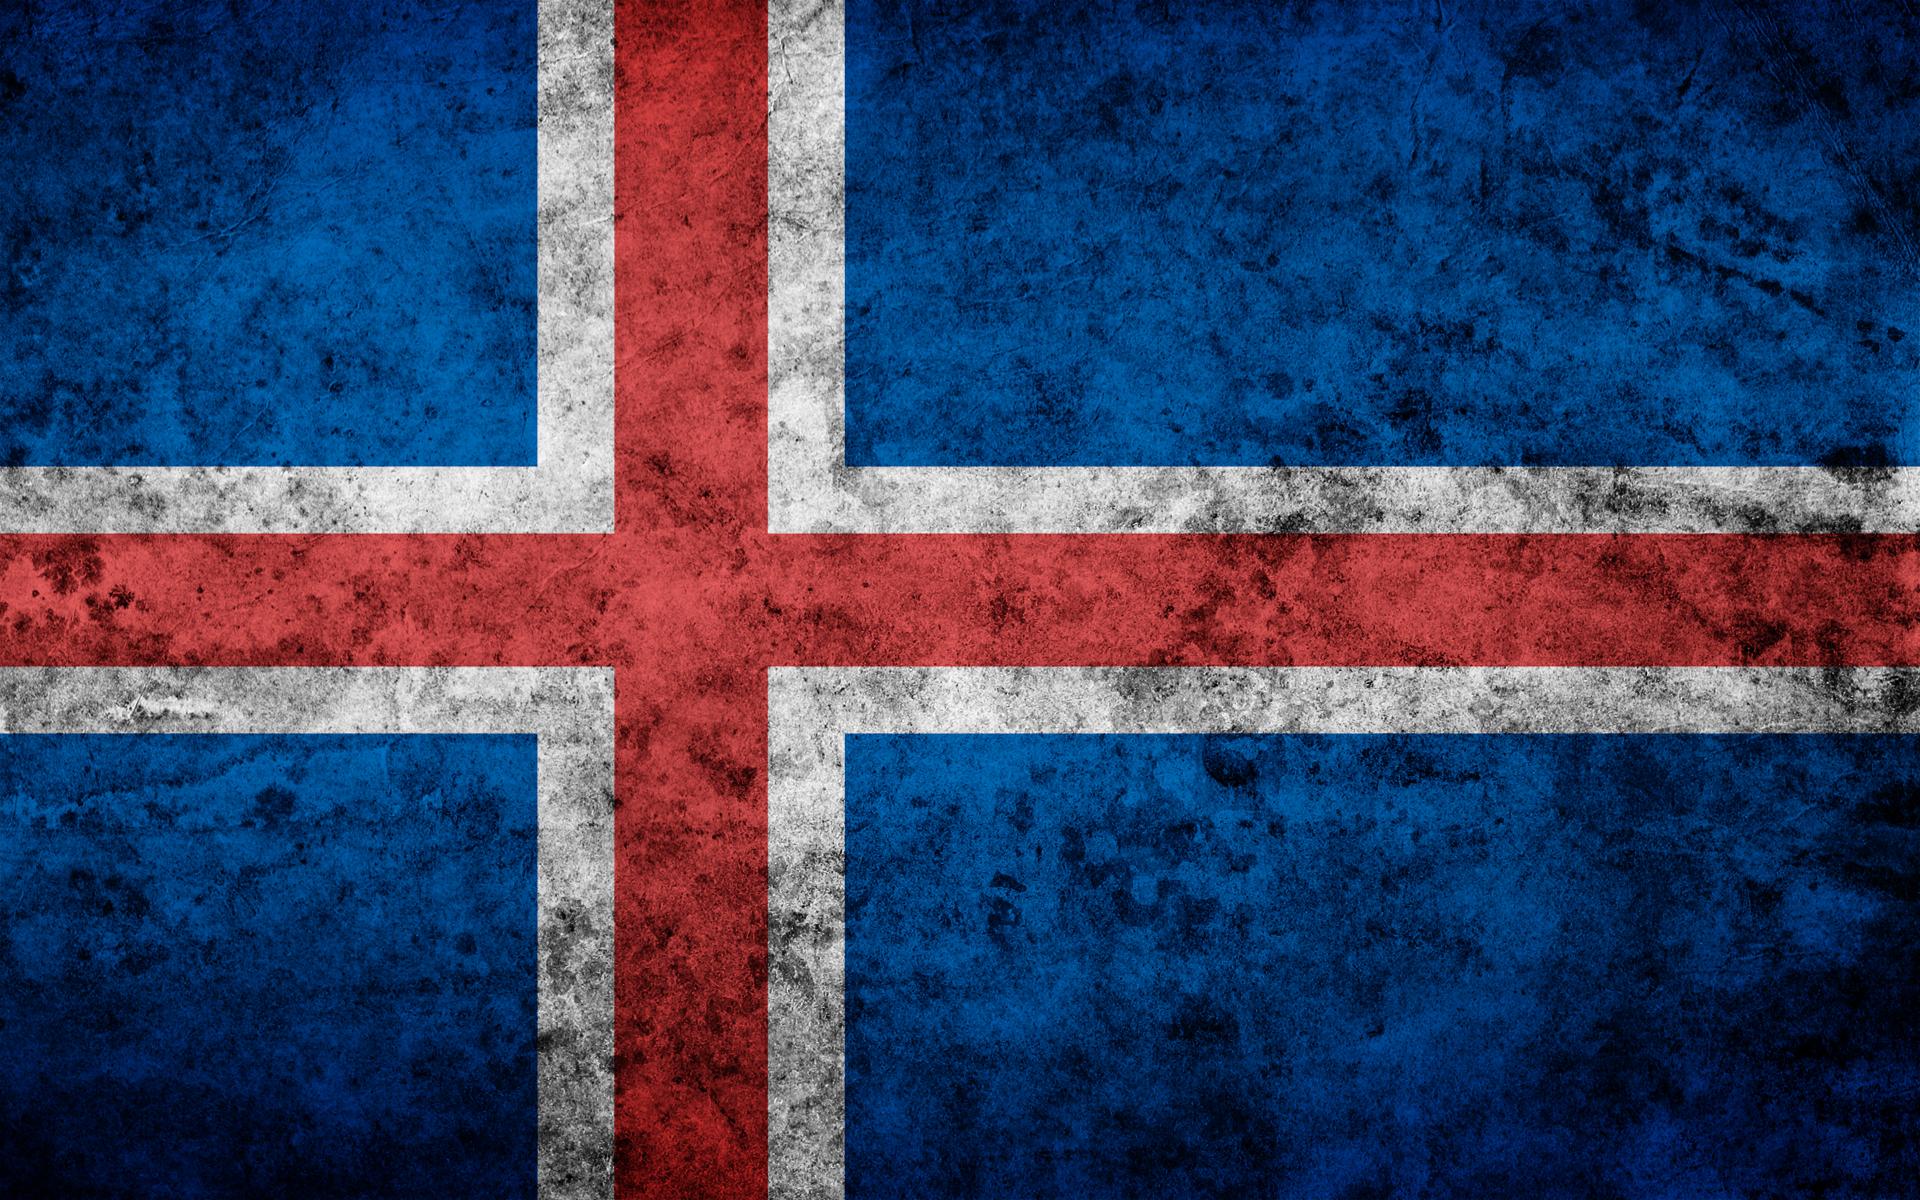 Iceland Grunge Flag wallpapers | Iceland Grunge Flag stock photos